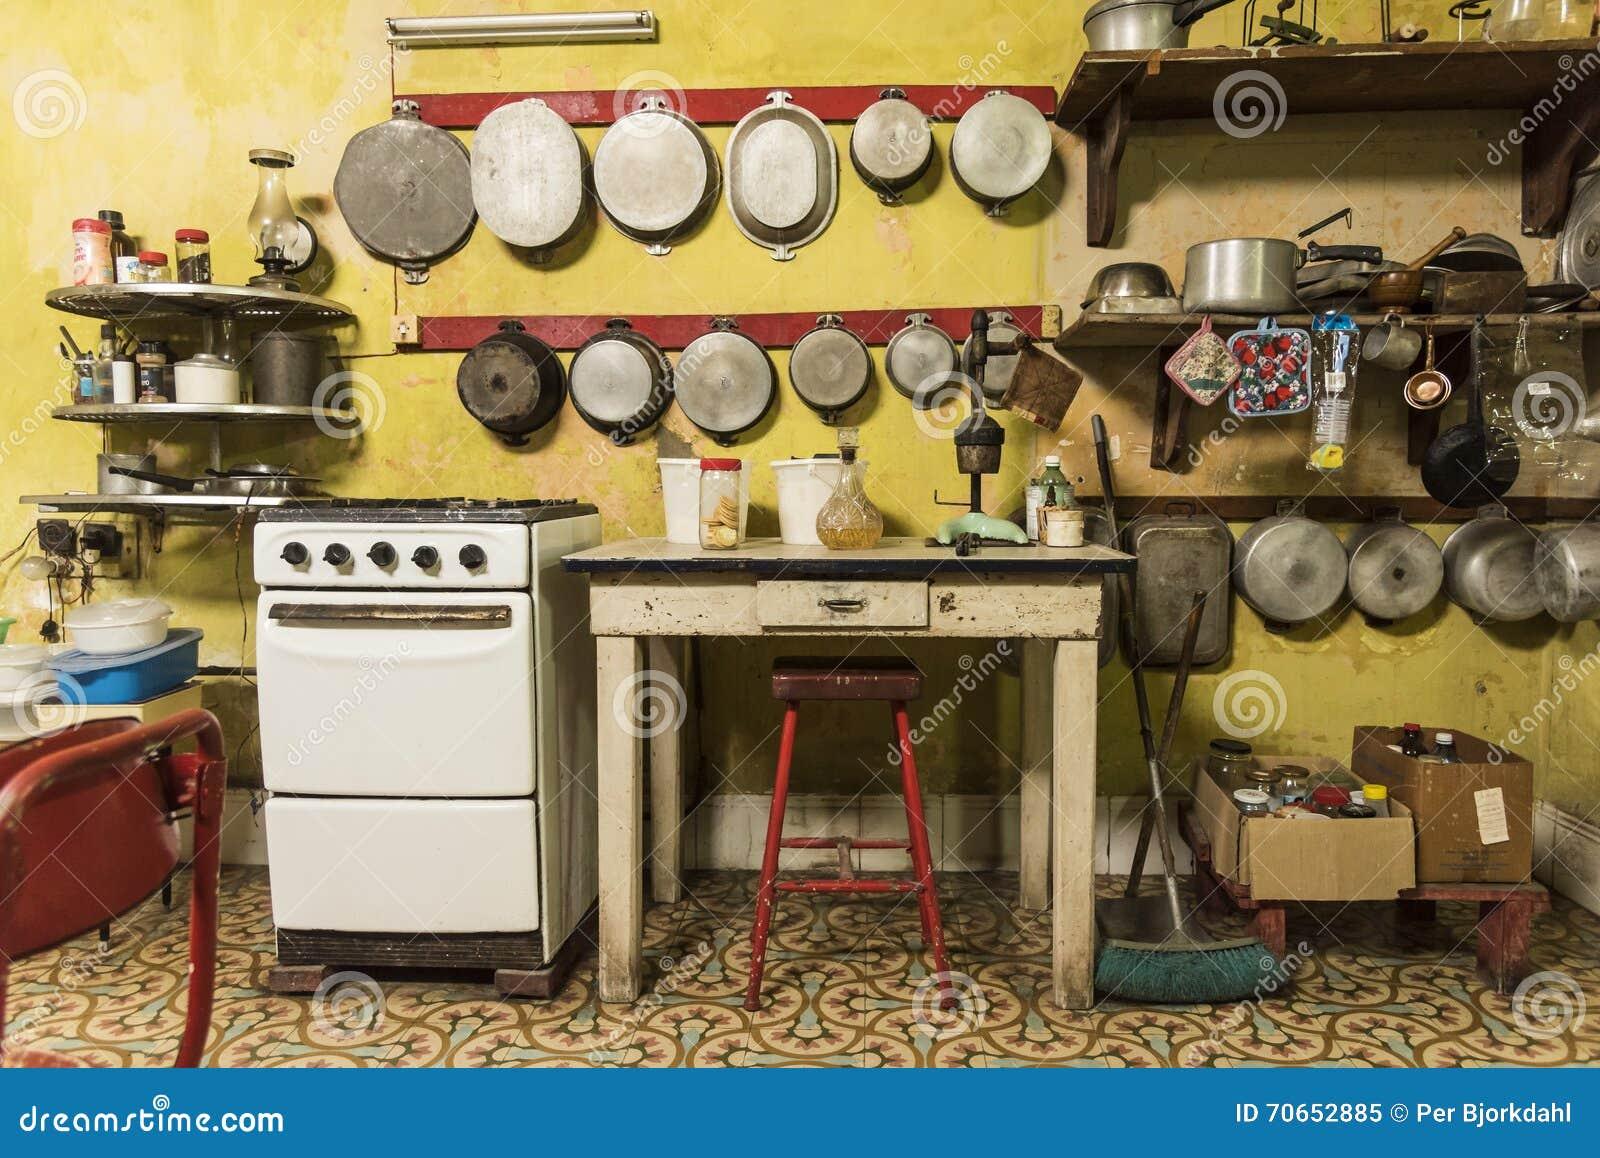 Kitchen In Casa Alonso Havana Editorial Image - Image: 70652885